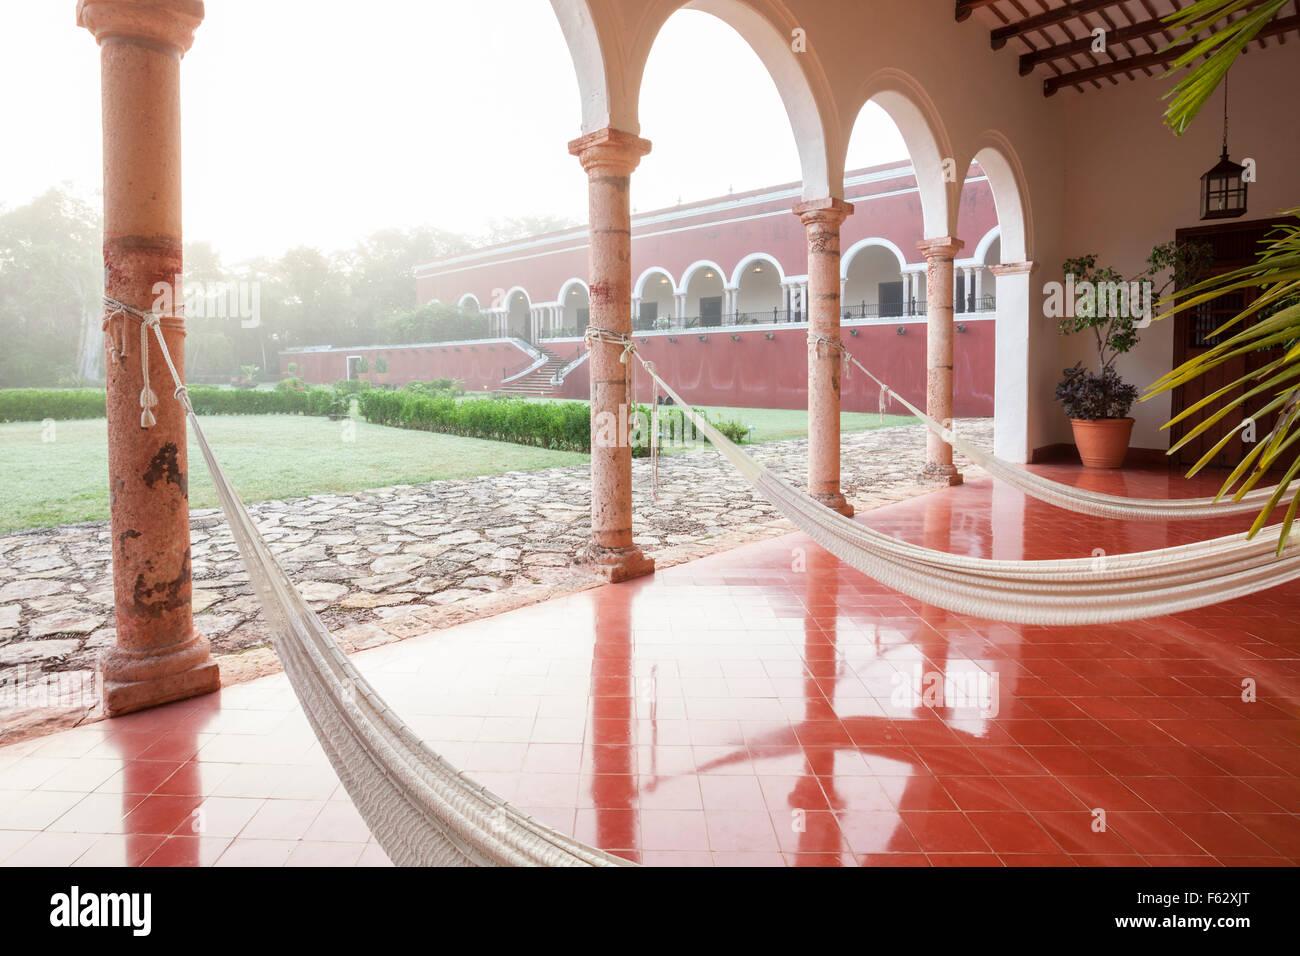 Hammocks line the patio on a misty morning at the Temozon hacienda in Yucatan, Mexico. - Stock Image